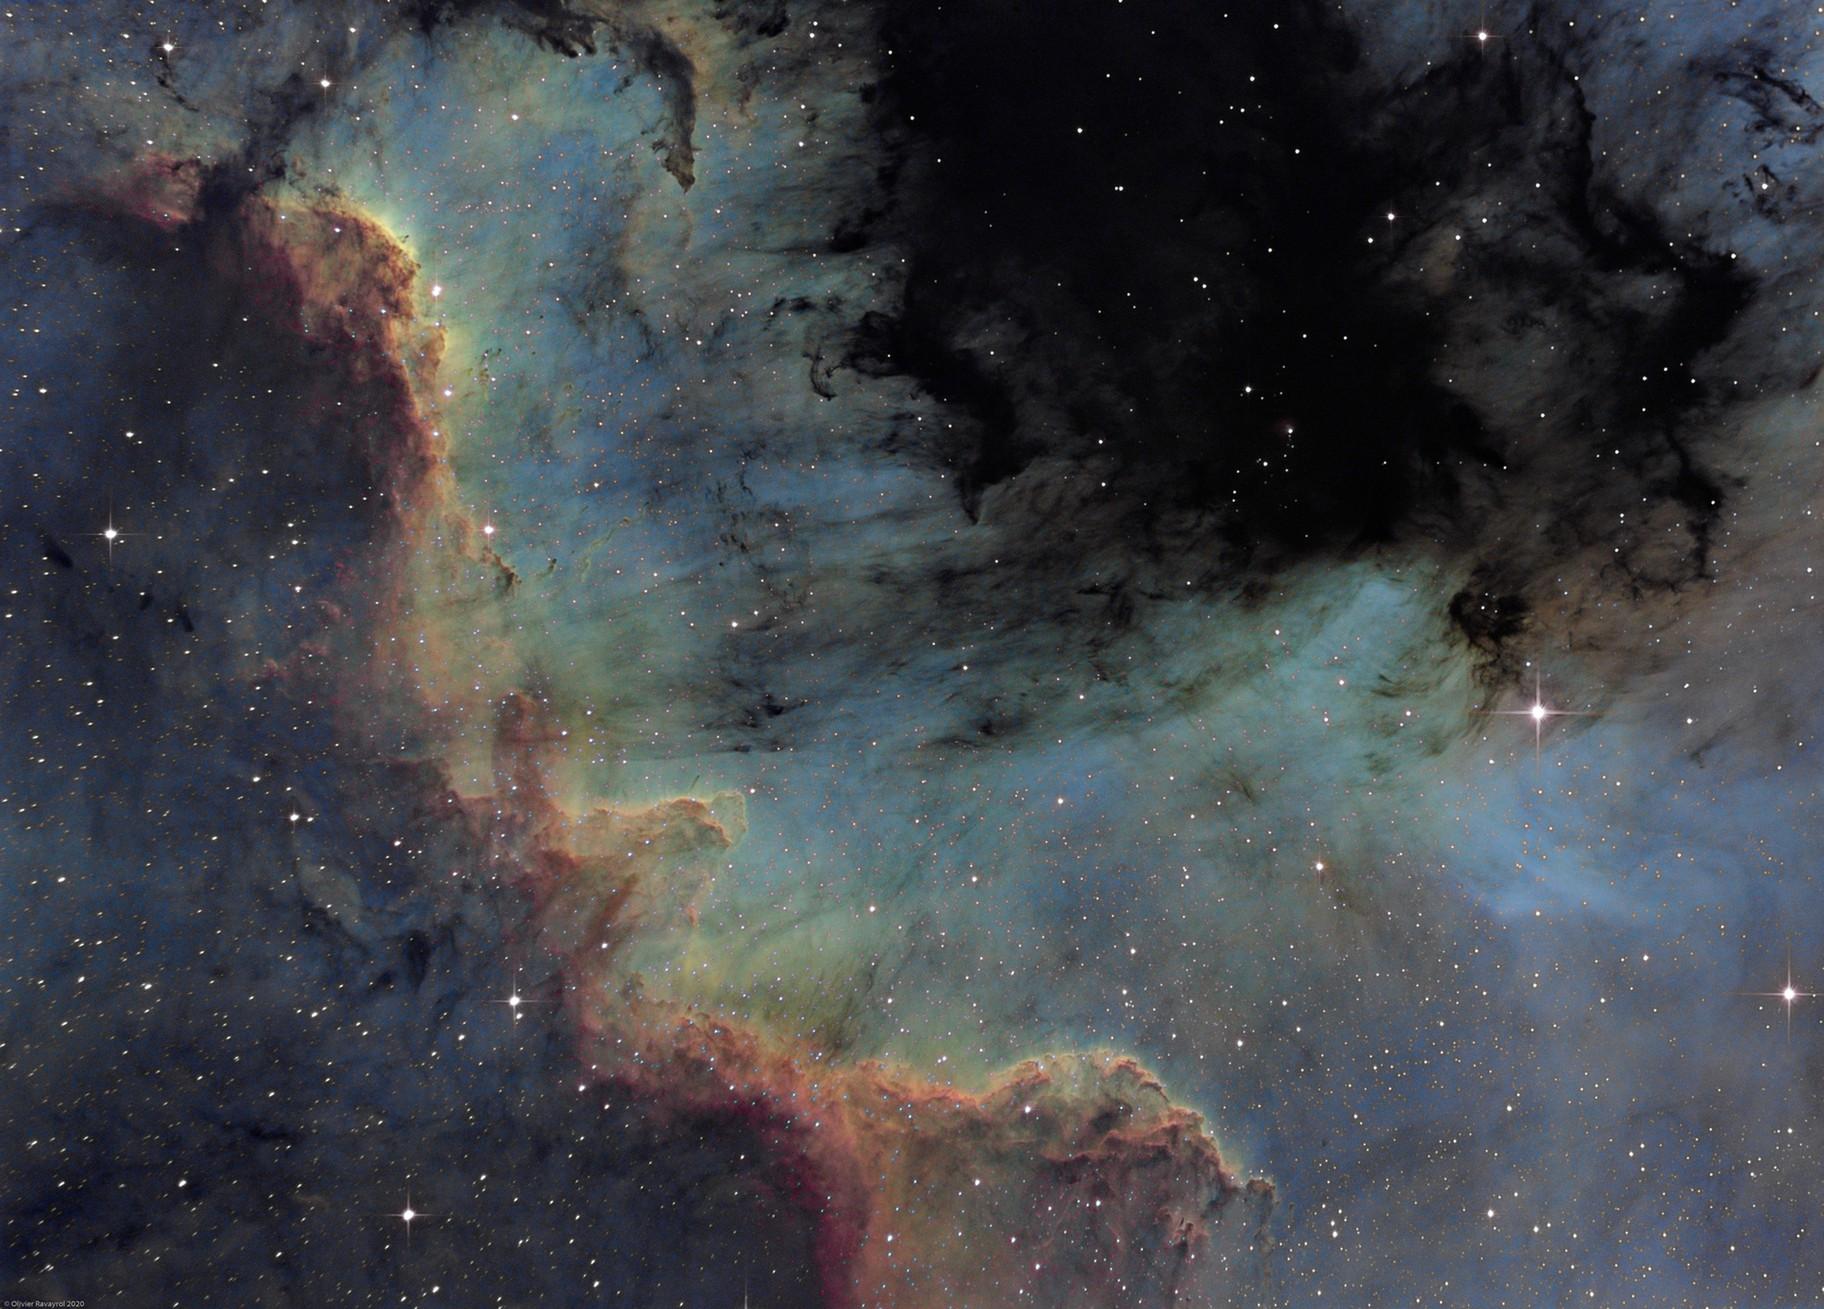 The great wall - North America Nebula